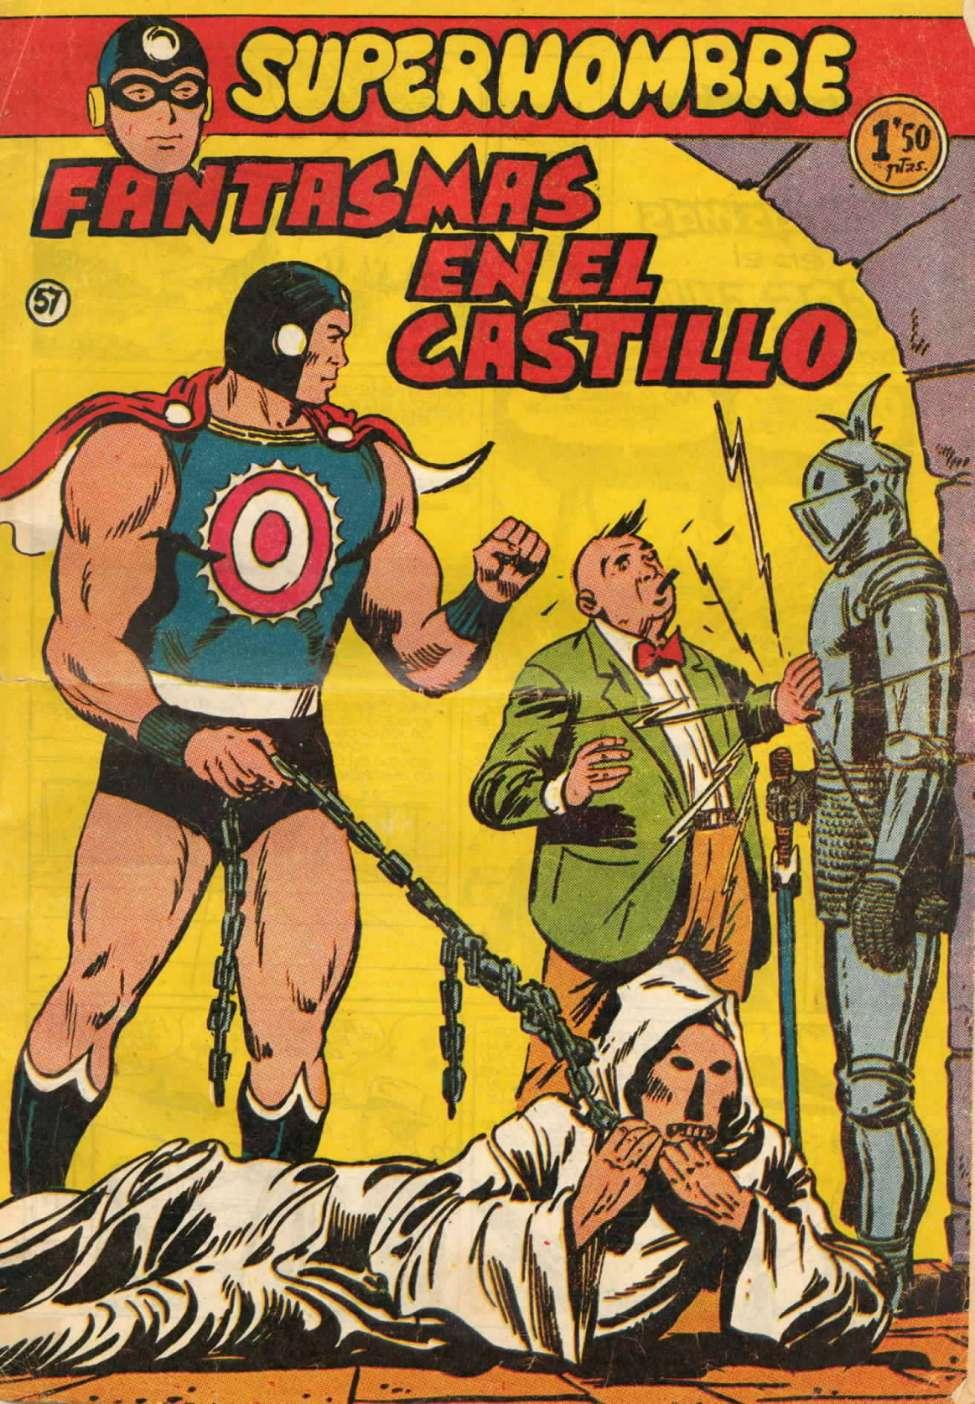 Comic Book Cover For SuperHombre 57 Fantasmas en el castillo